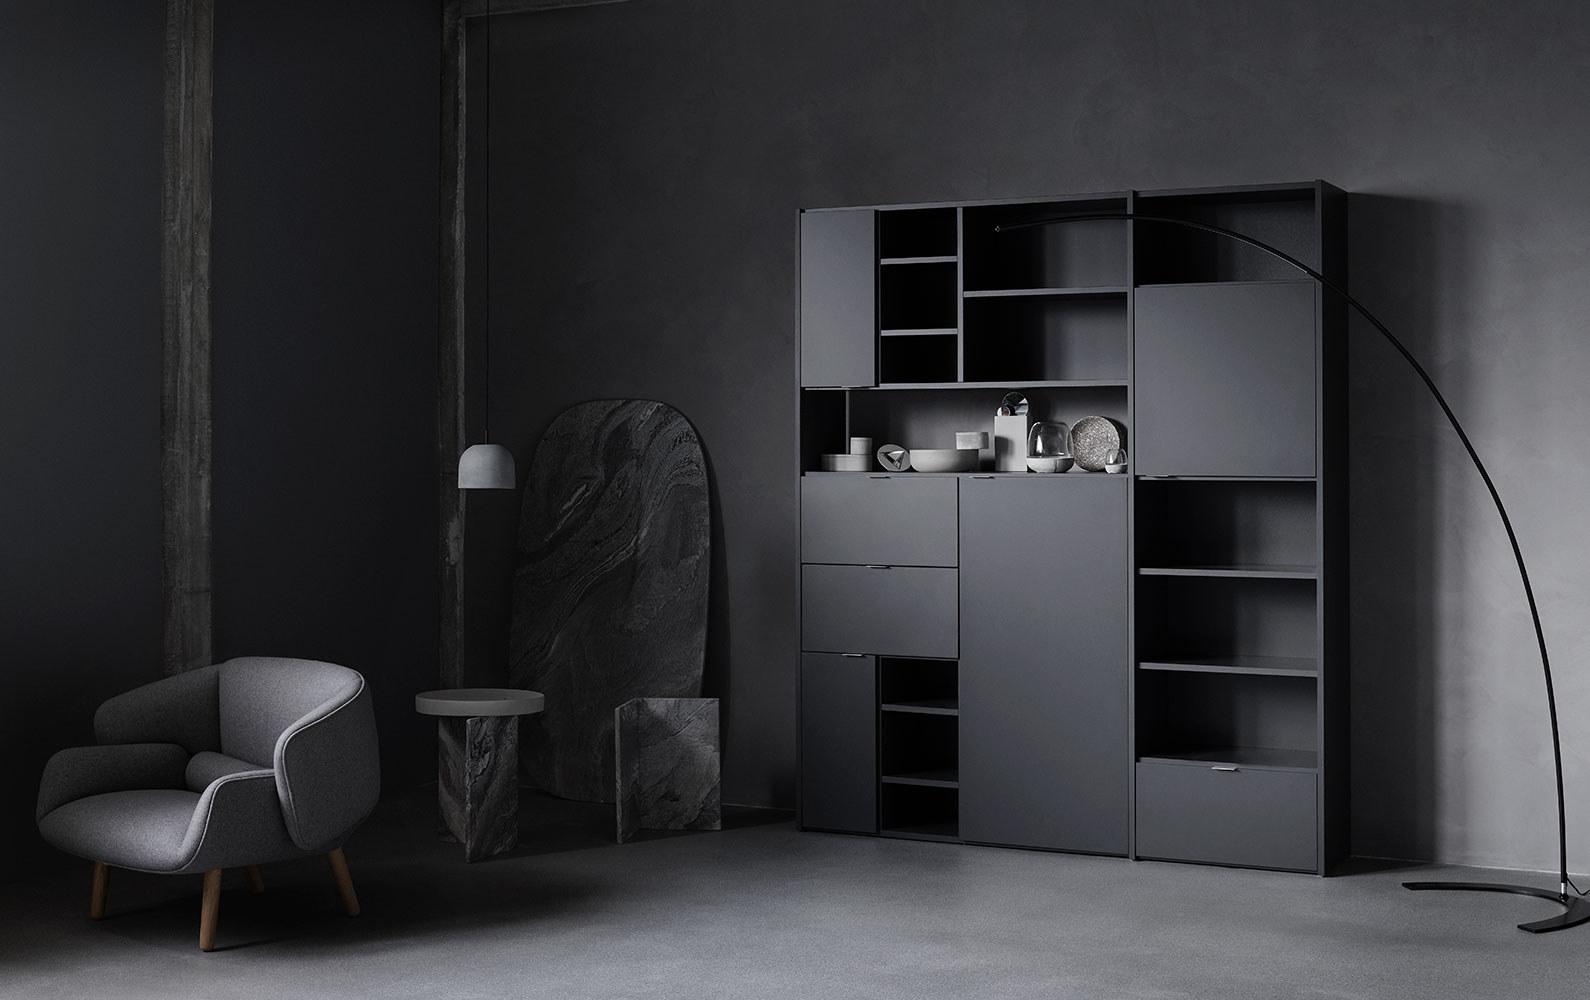 Designs by Morten Georgsen - Copenhagen 壁面収納